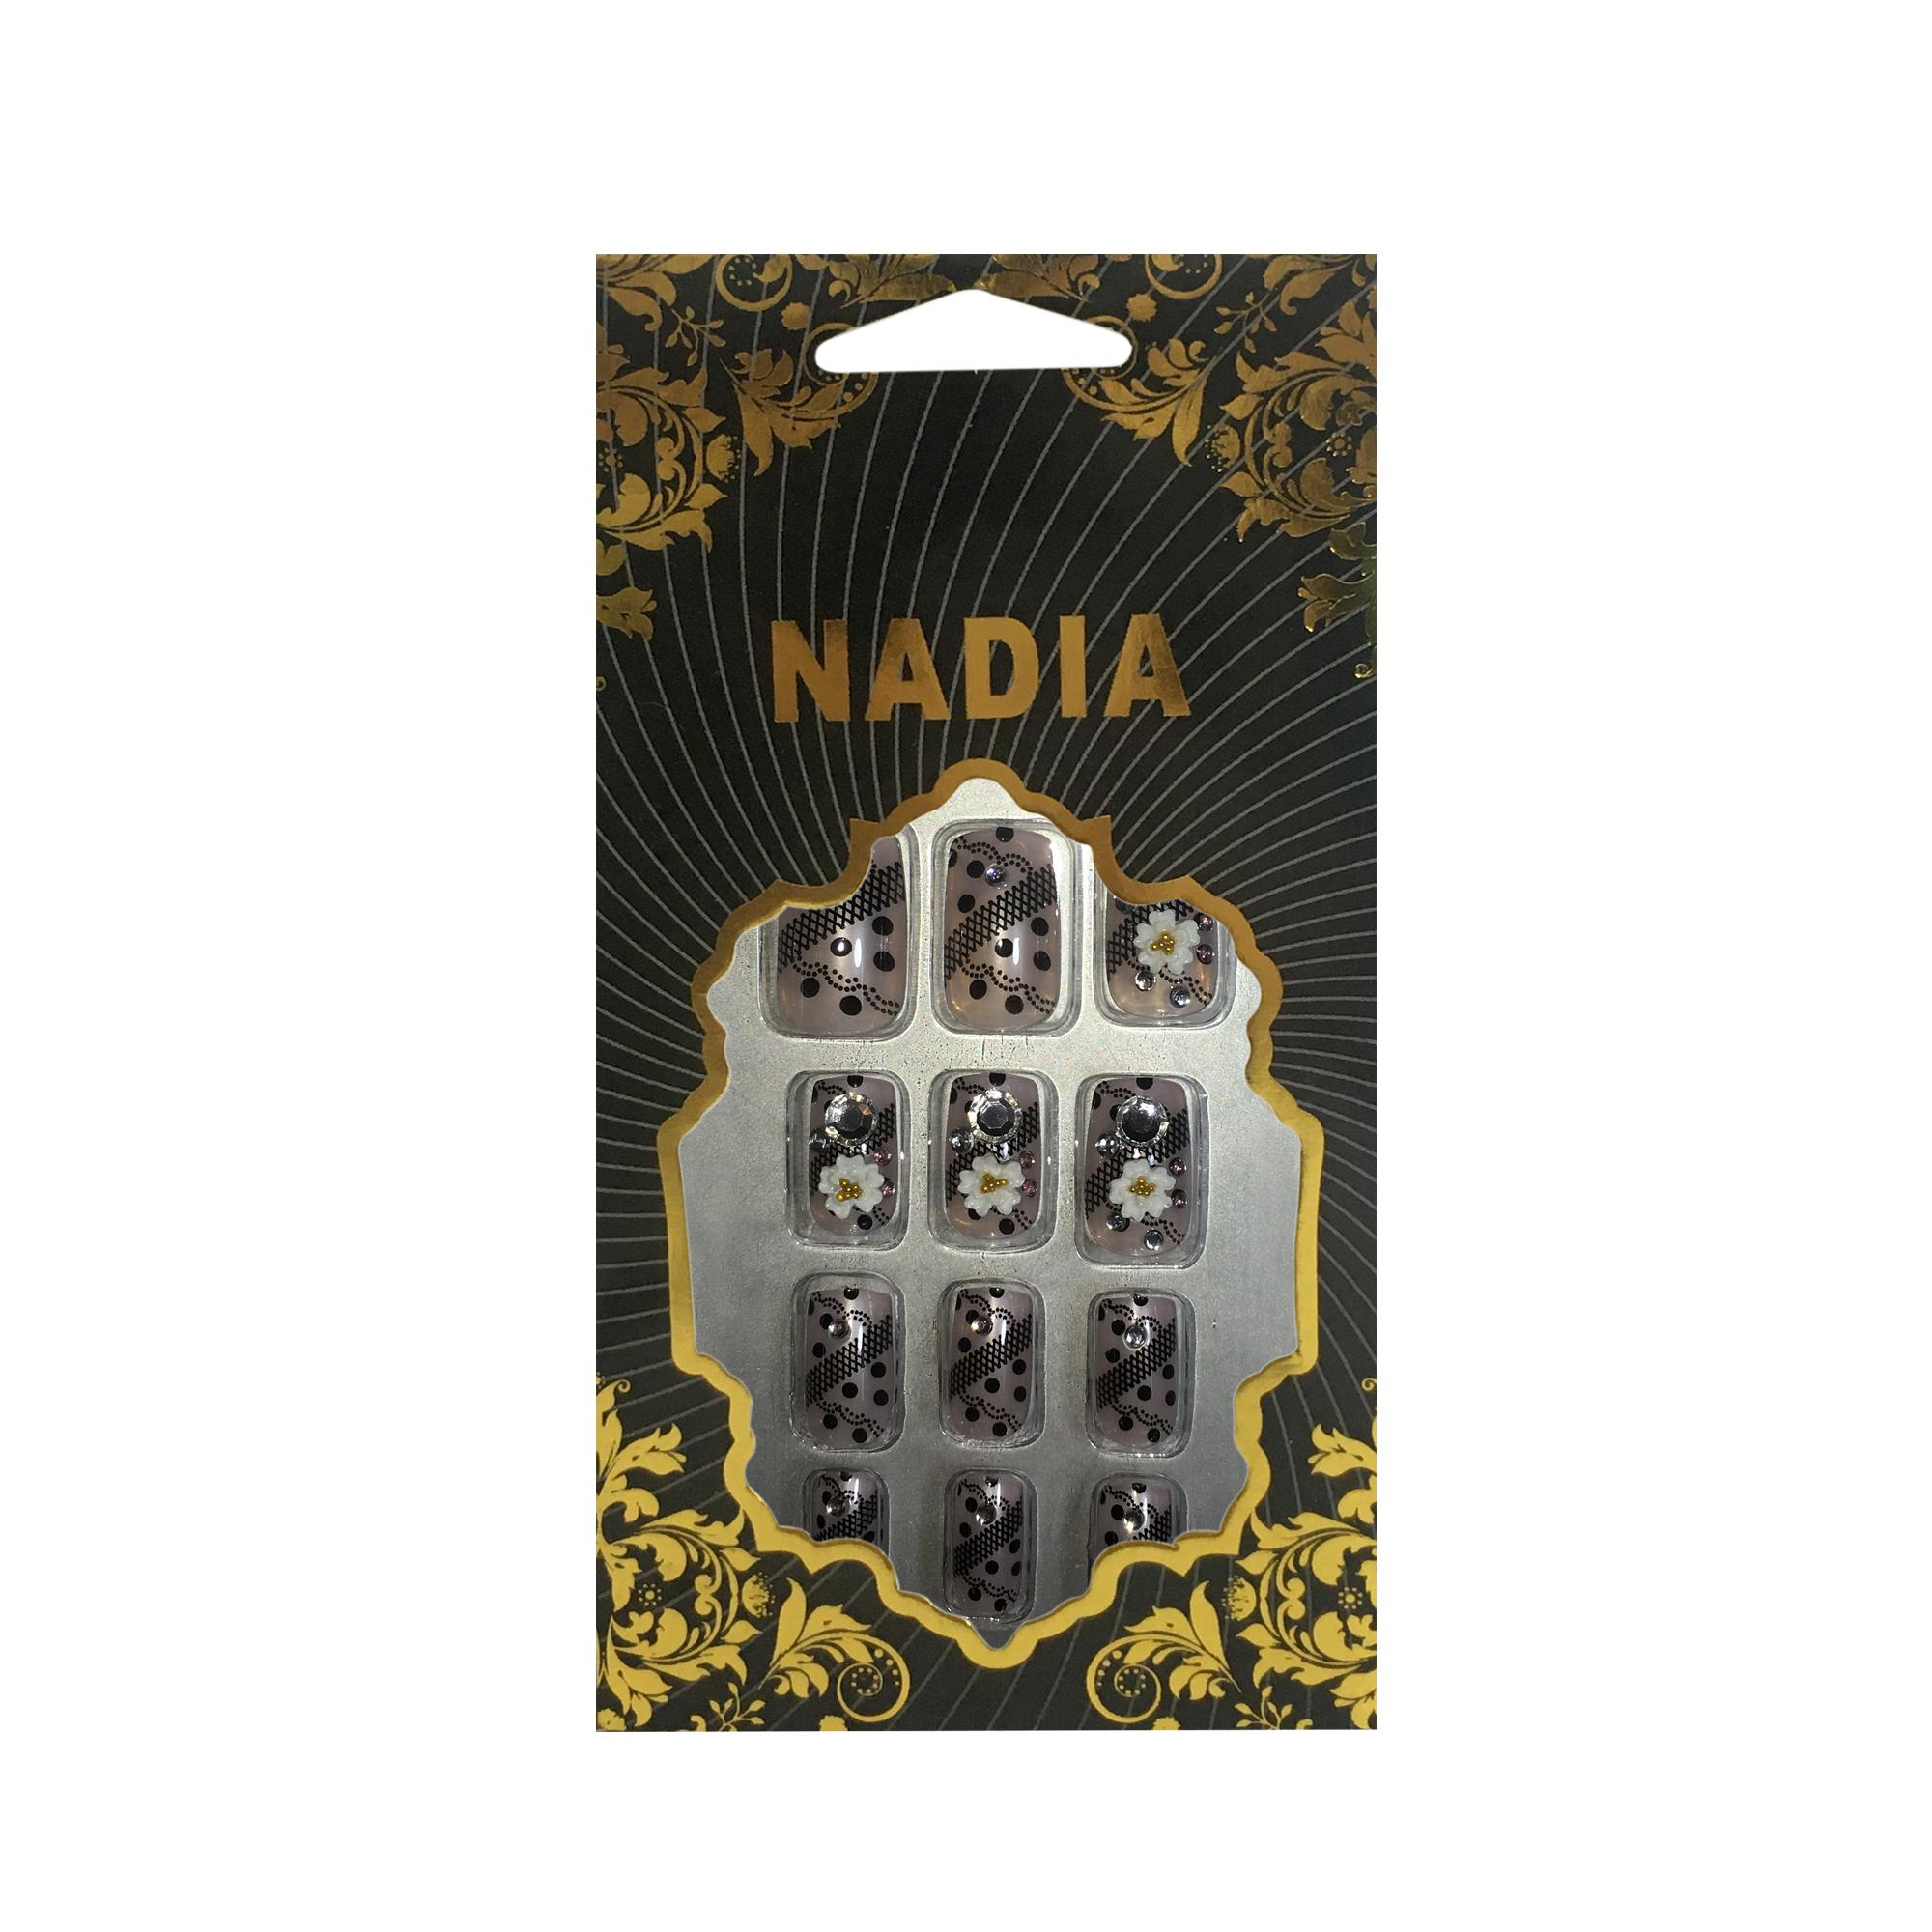 ناخن مصنوعی نادیا مدل N014 بسته 12 عددی